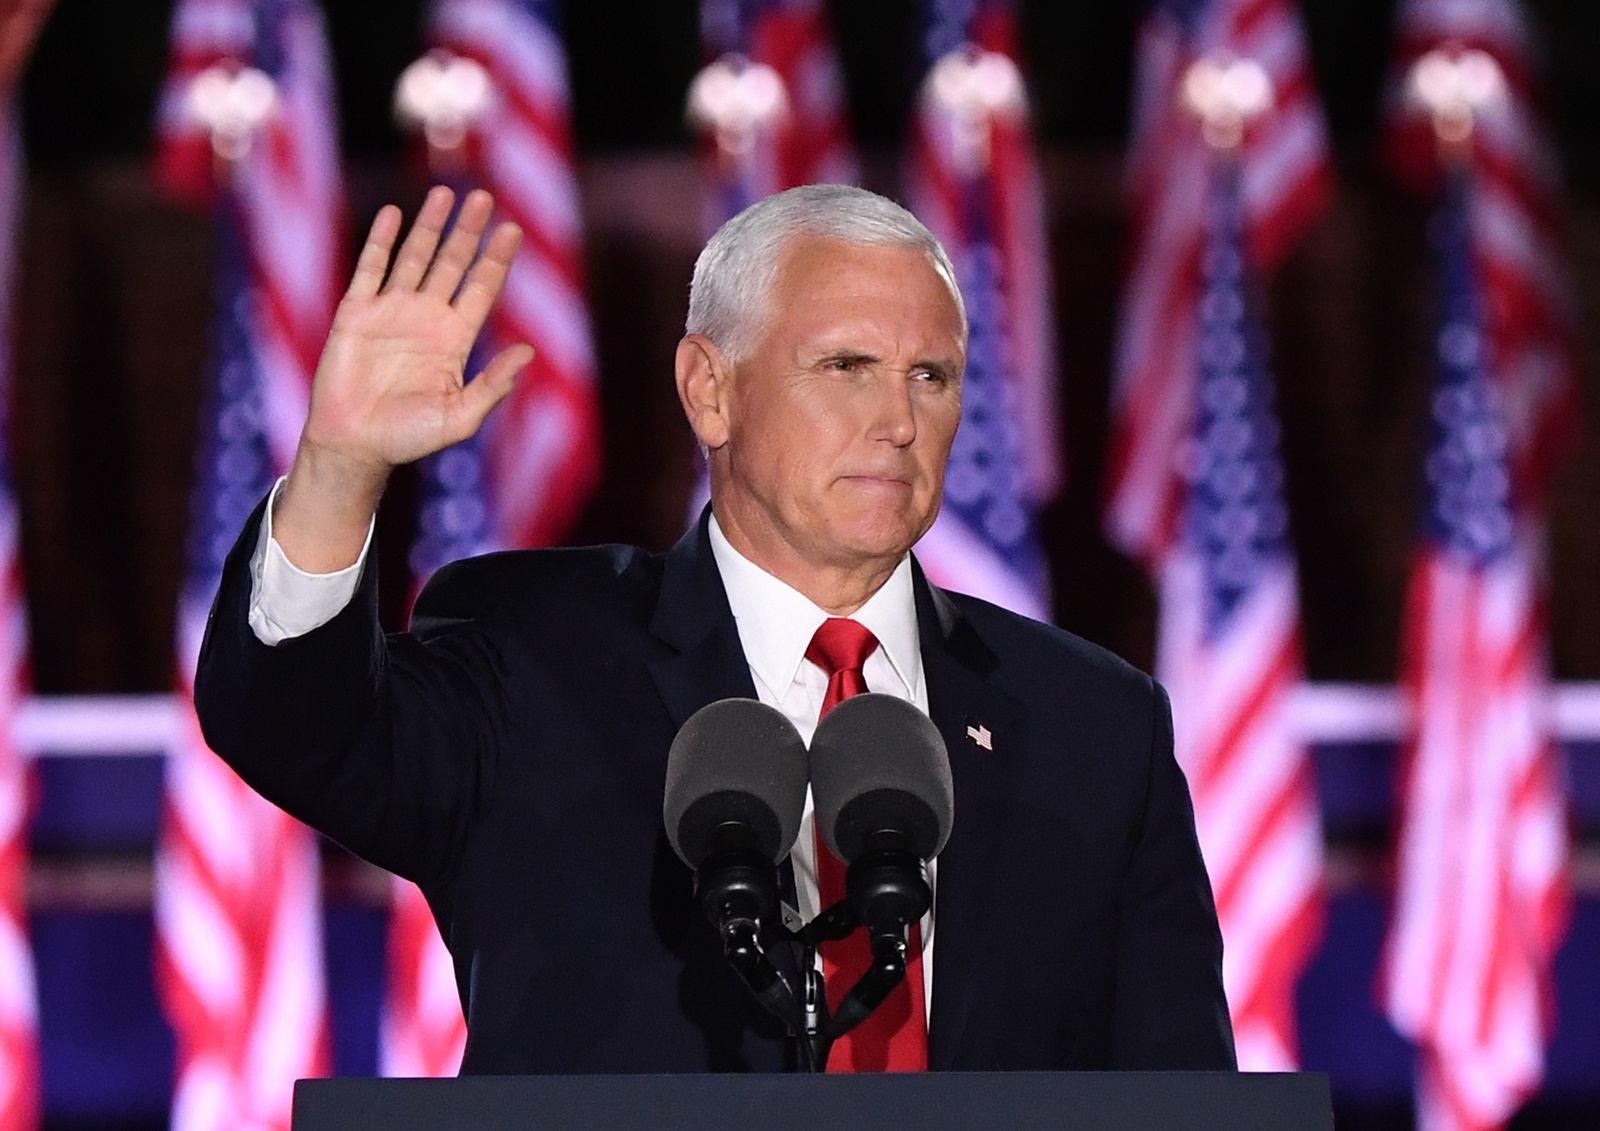 Virtual Republican National Convention in USA, Baltimore - 26 Aug 2020